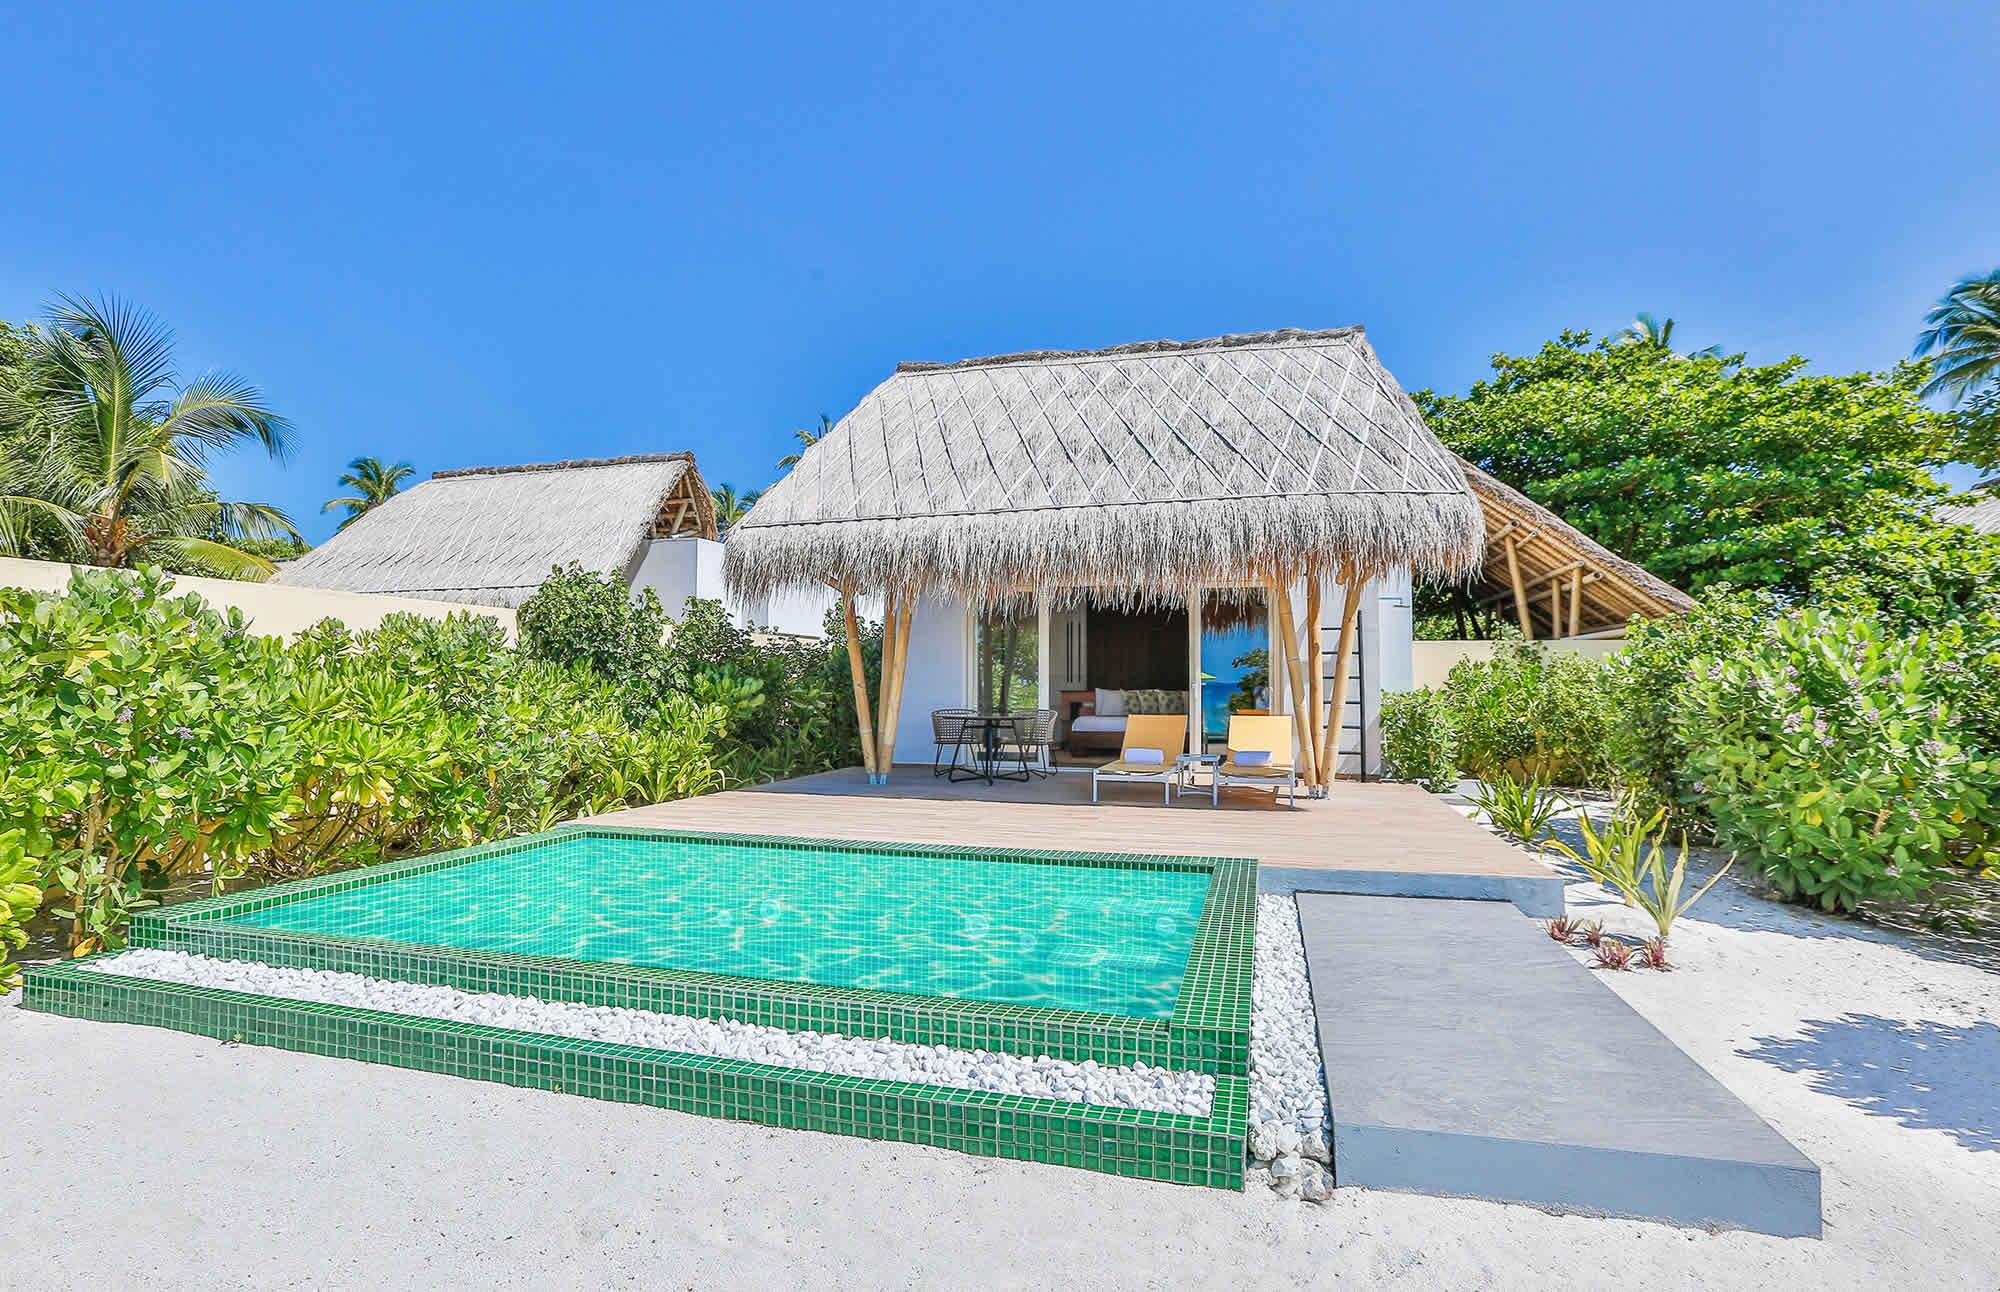 Beach Villa with pool exterior